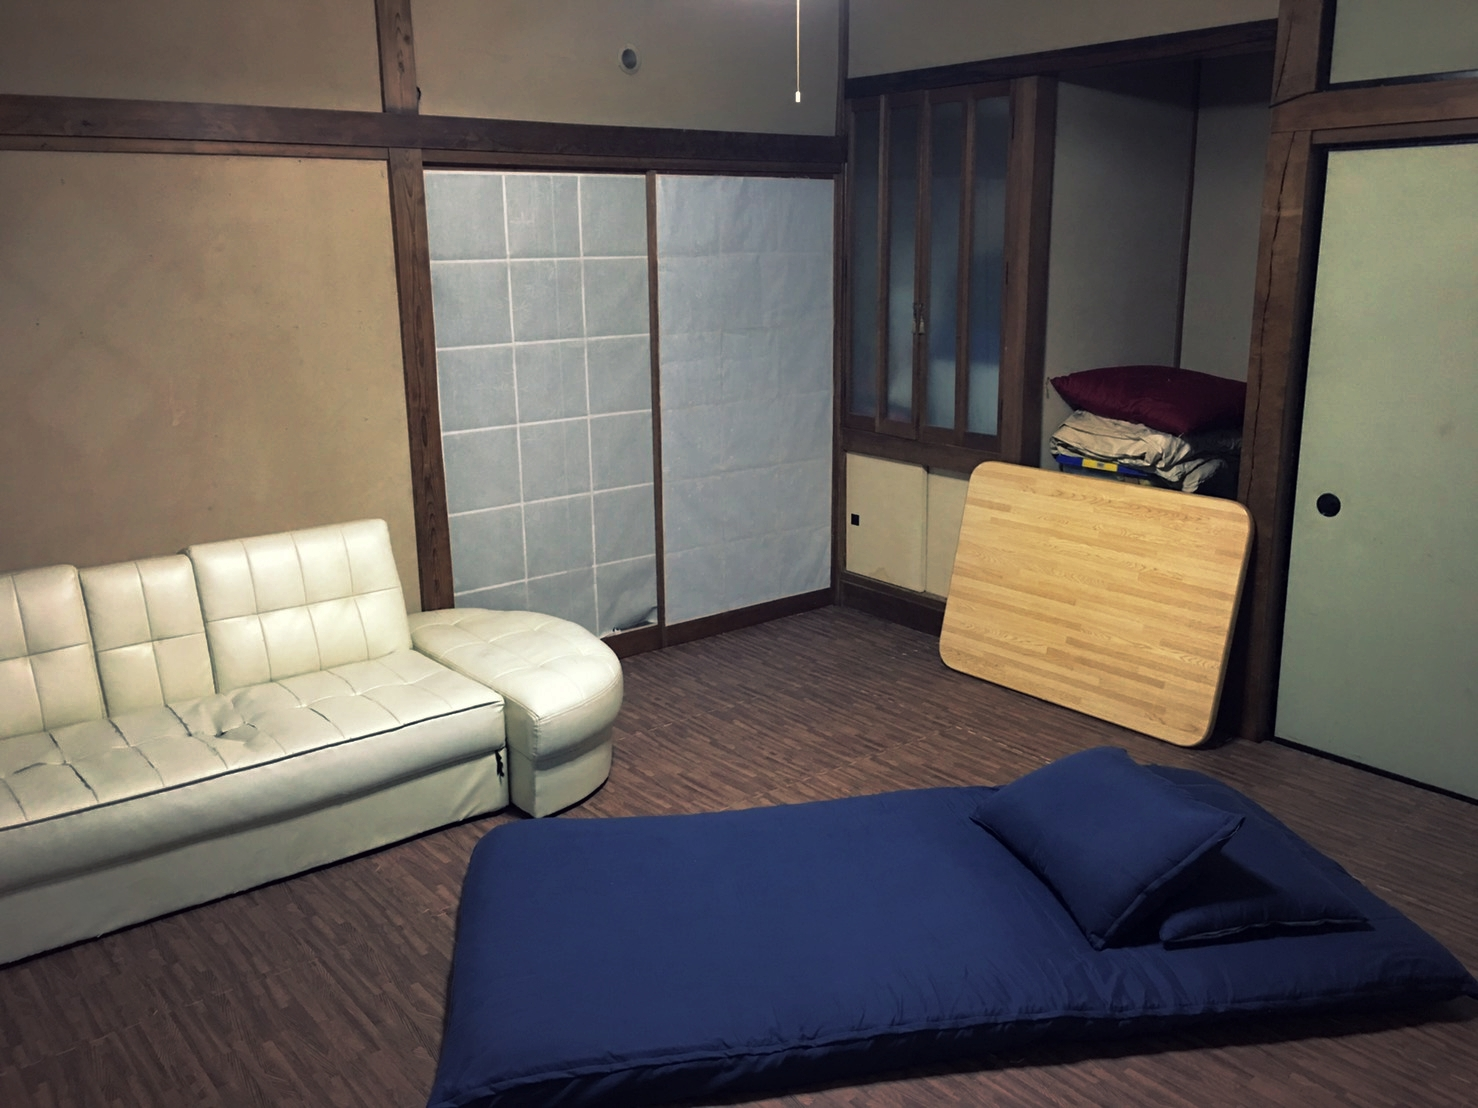 Downstair Room (Max Capacity : 4-5 pax)